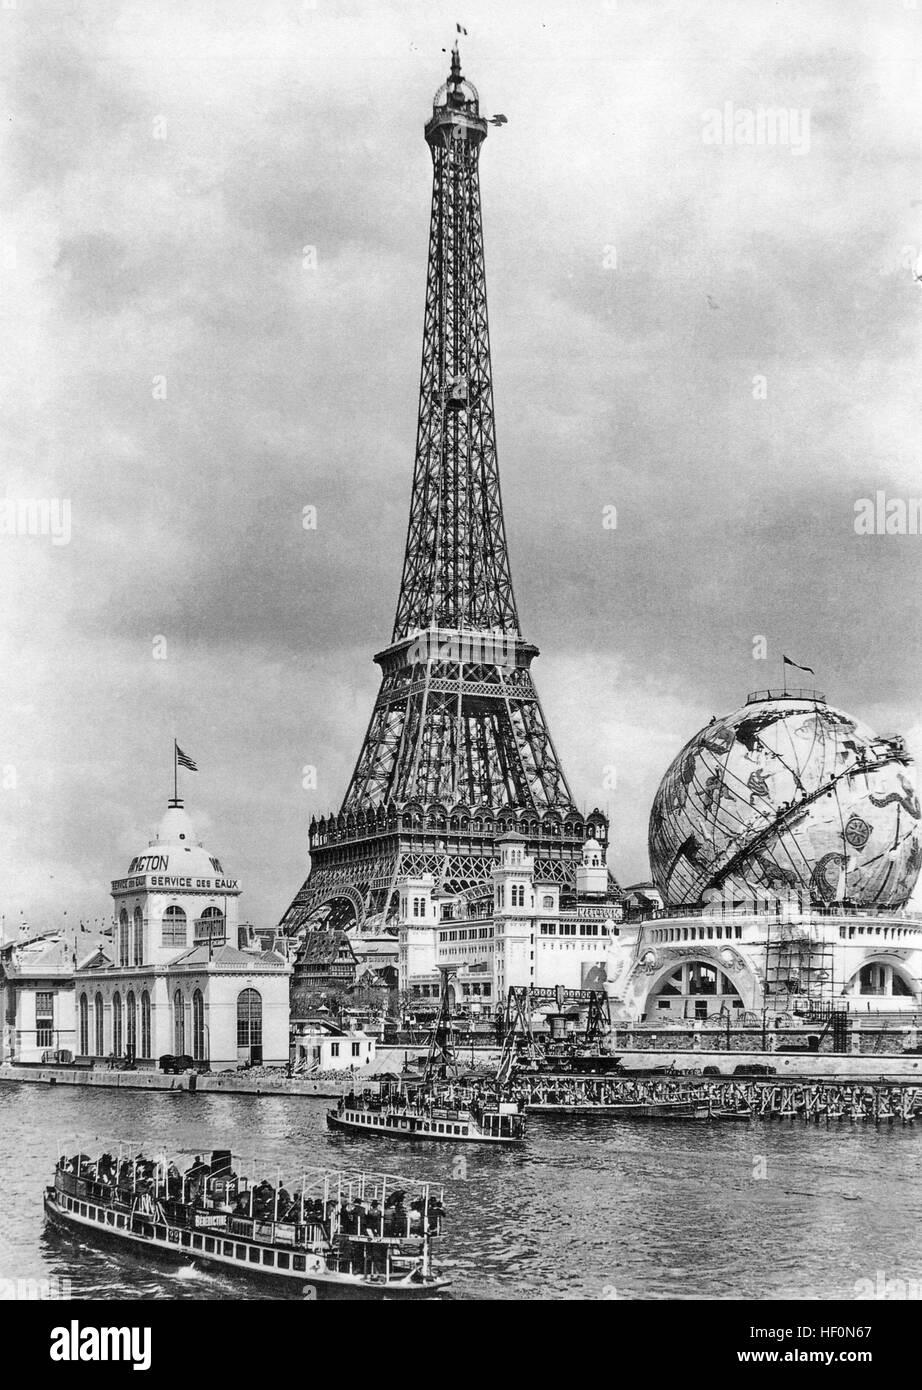 1900 WORLD'S FAIR, Paris. - Stock Image